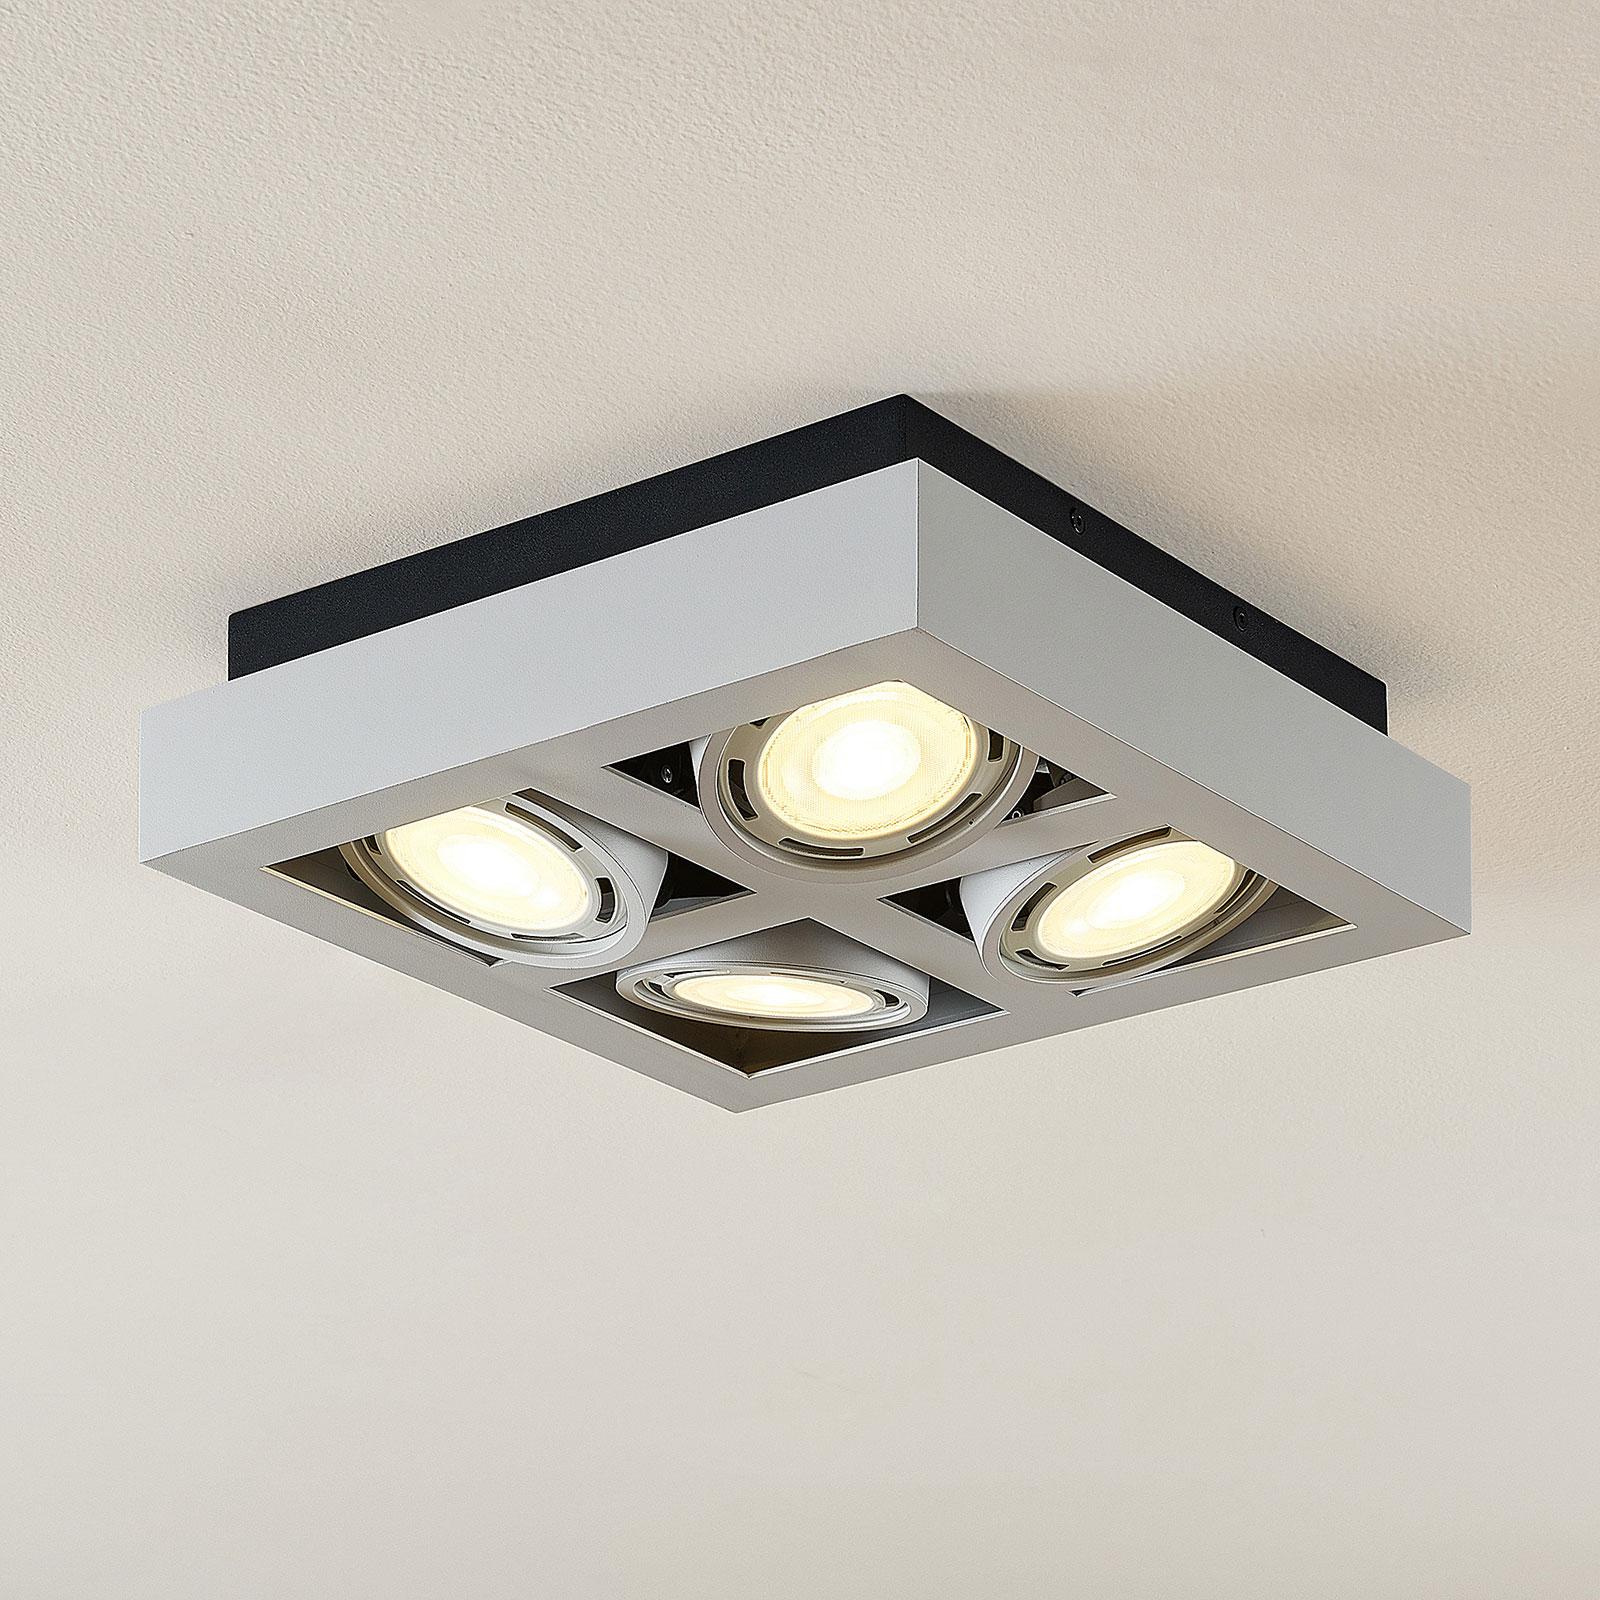 Plafoniera LED Ronka quadrata, 4 luci, bianca